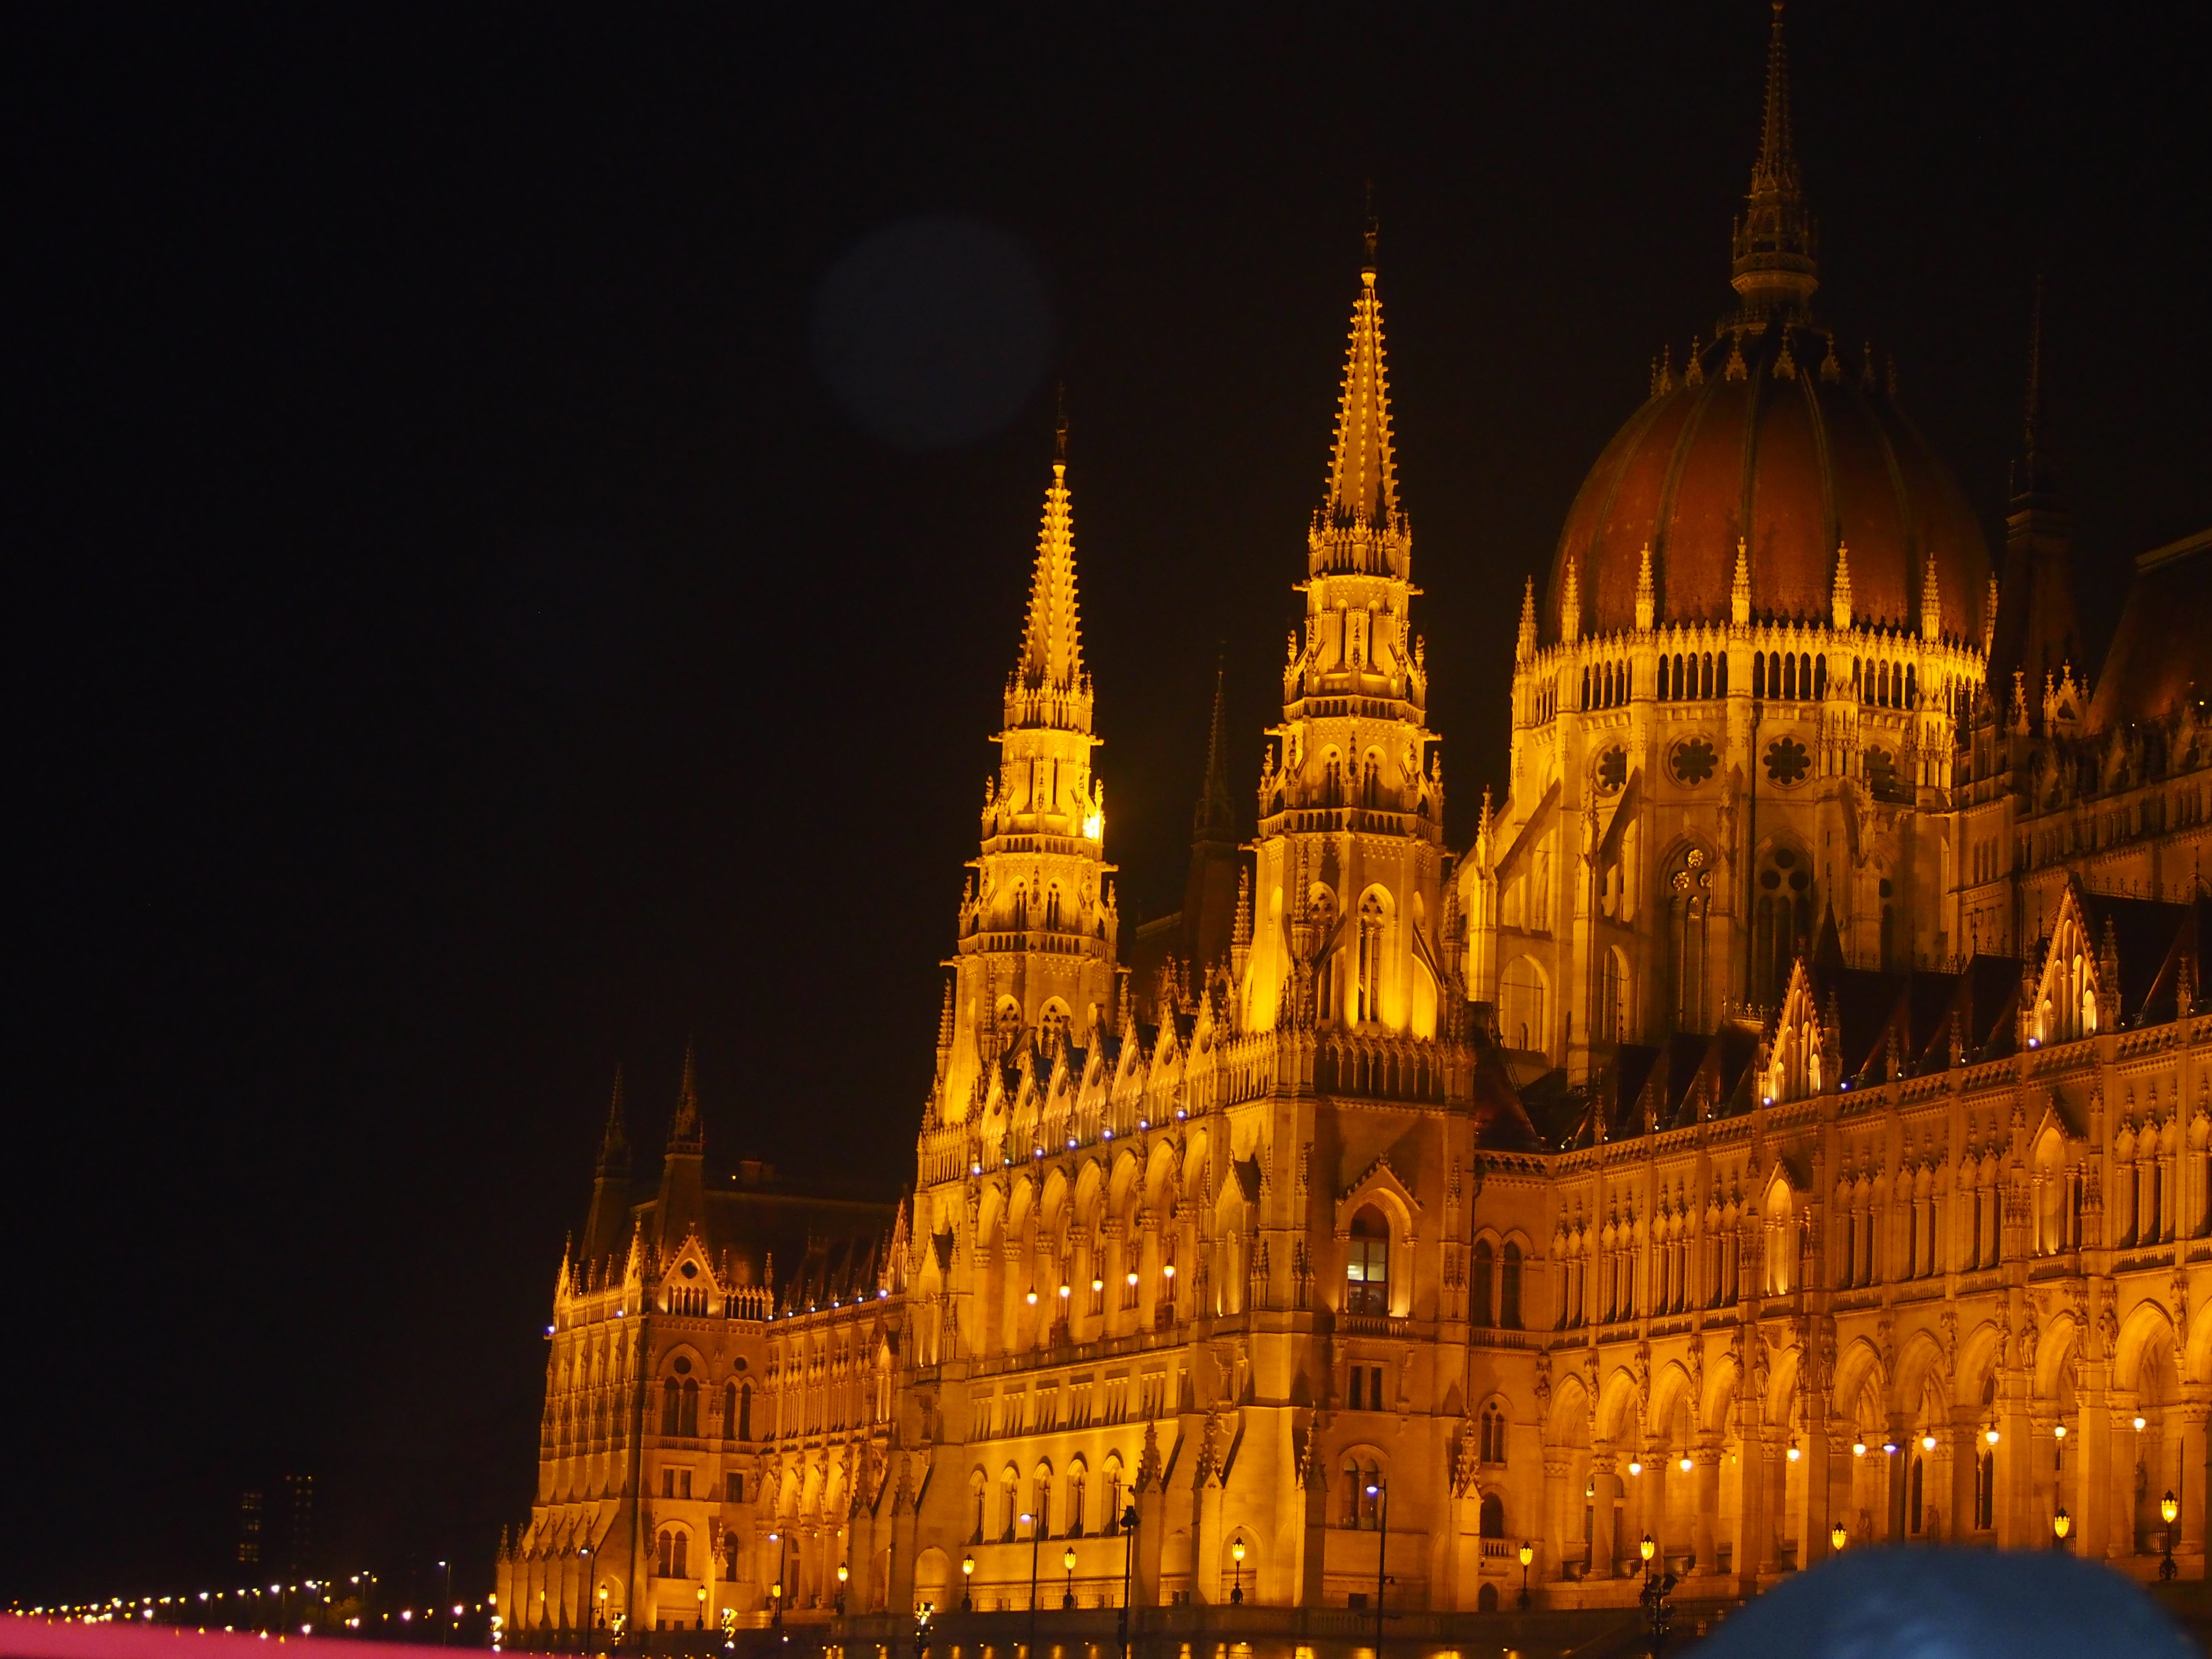 Parlamentsbygningen. Overdådigt smukt. Og på 18.000 kvm.